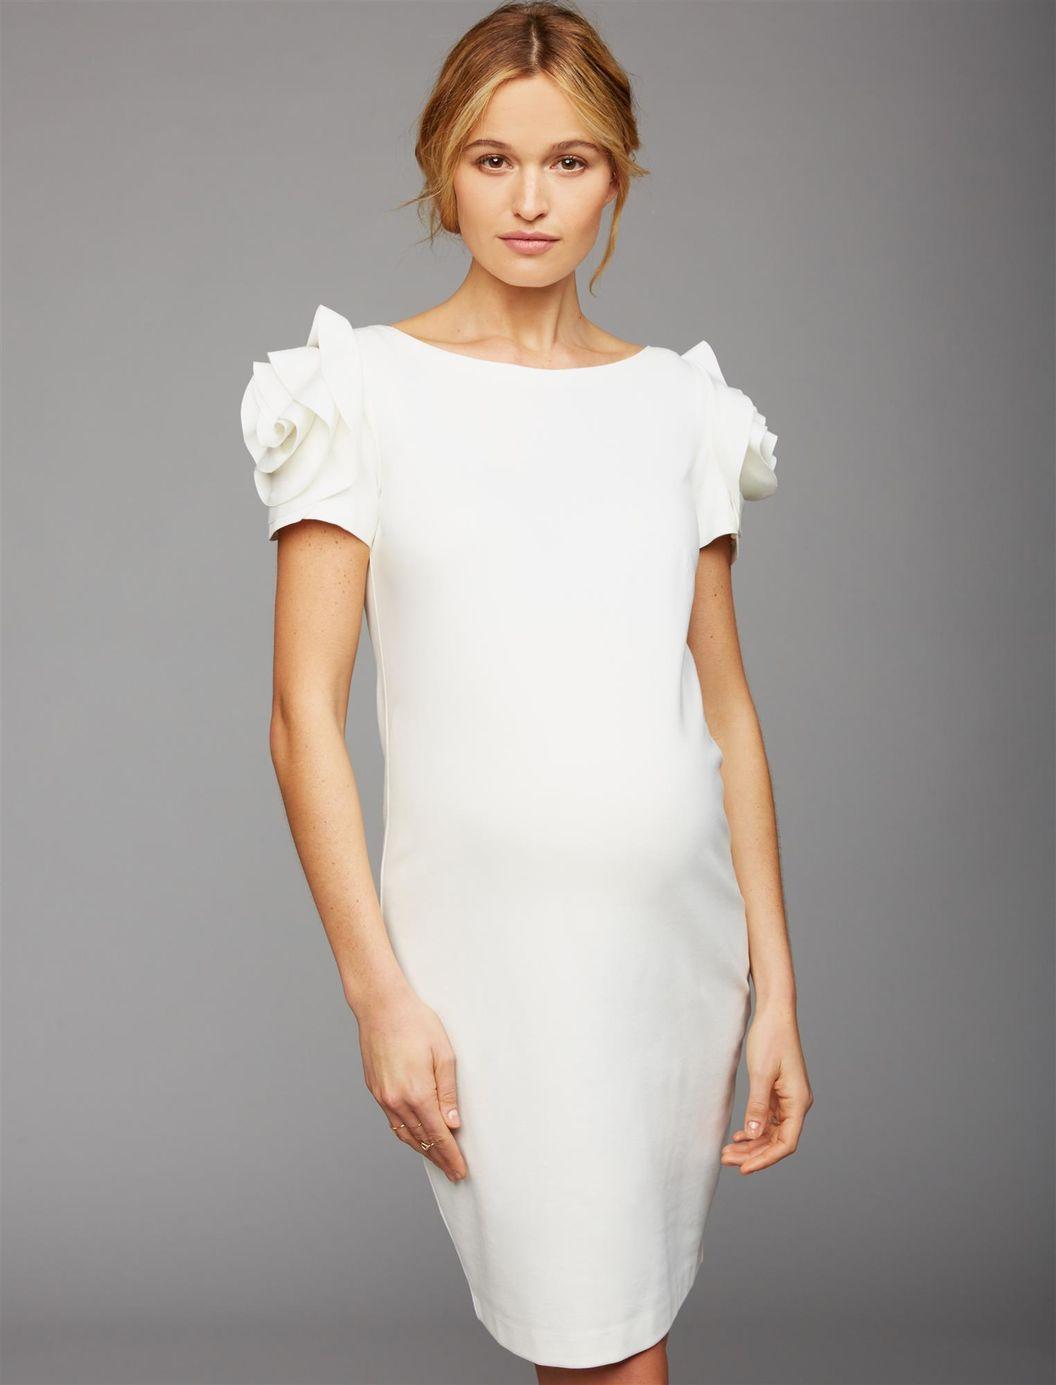 John stamos weds caitlin mchugh shop maternity wedding dresses pietro brunelli ruffled maternity dress ombrellifo Images